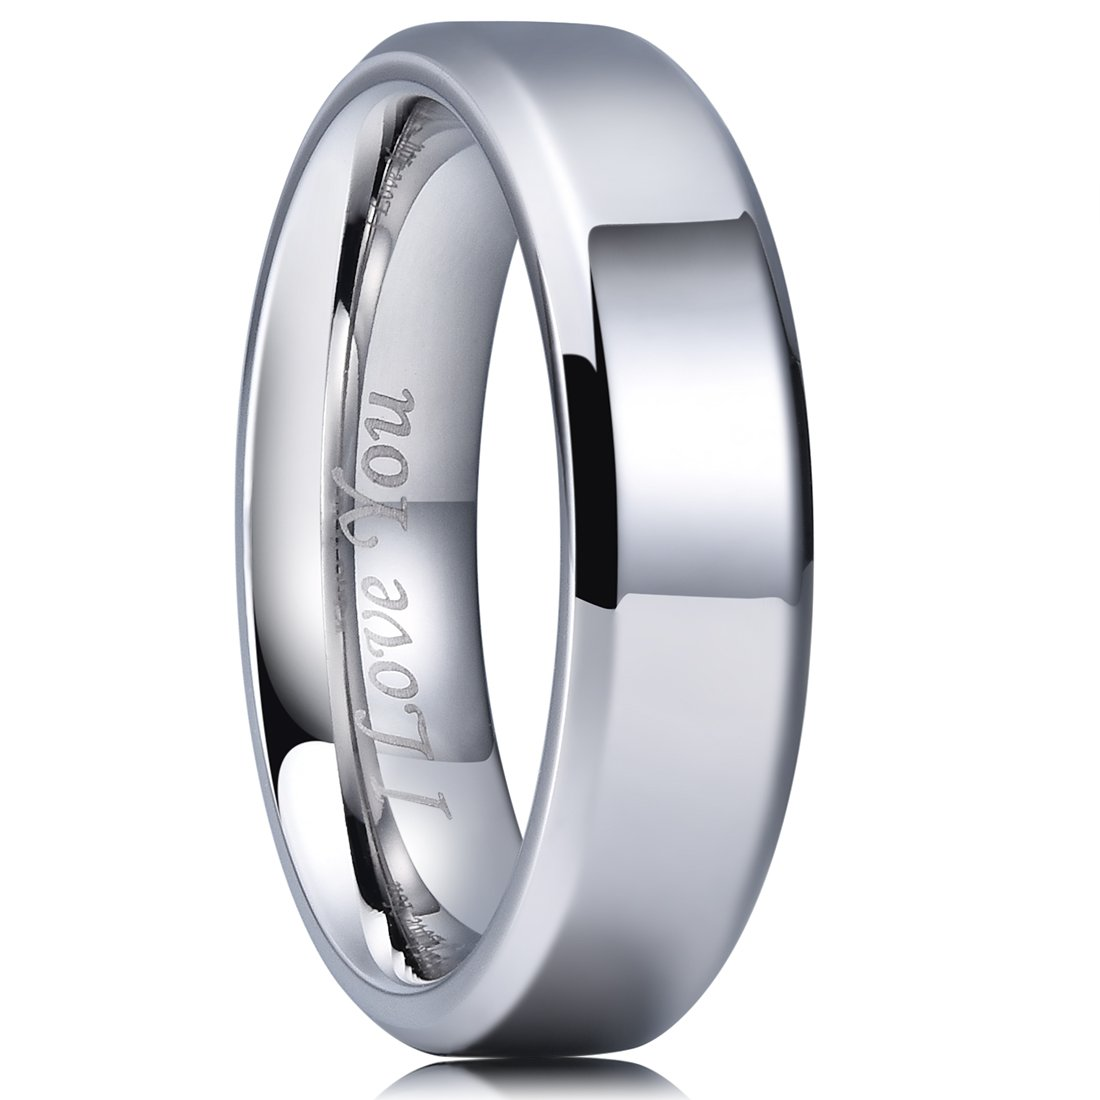 King Will BASIC 6mm Stainless Steel Ring Polished Plain Beveled Edge Wedding Band Laser Etched I Love You 7